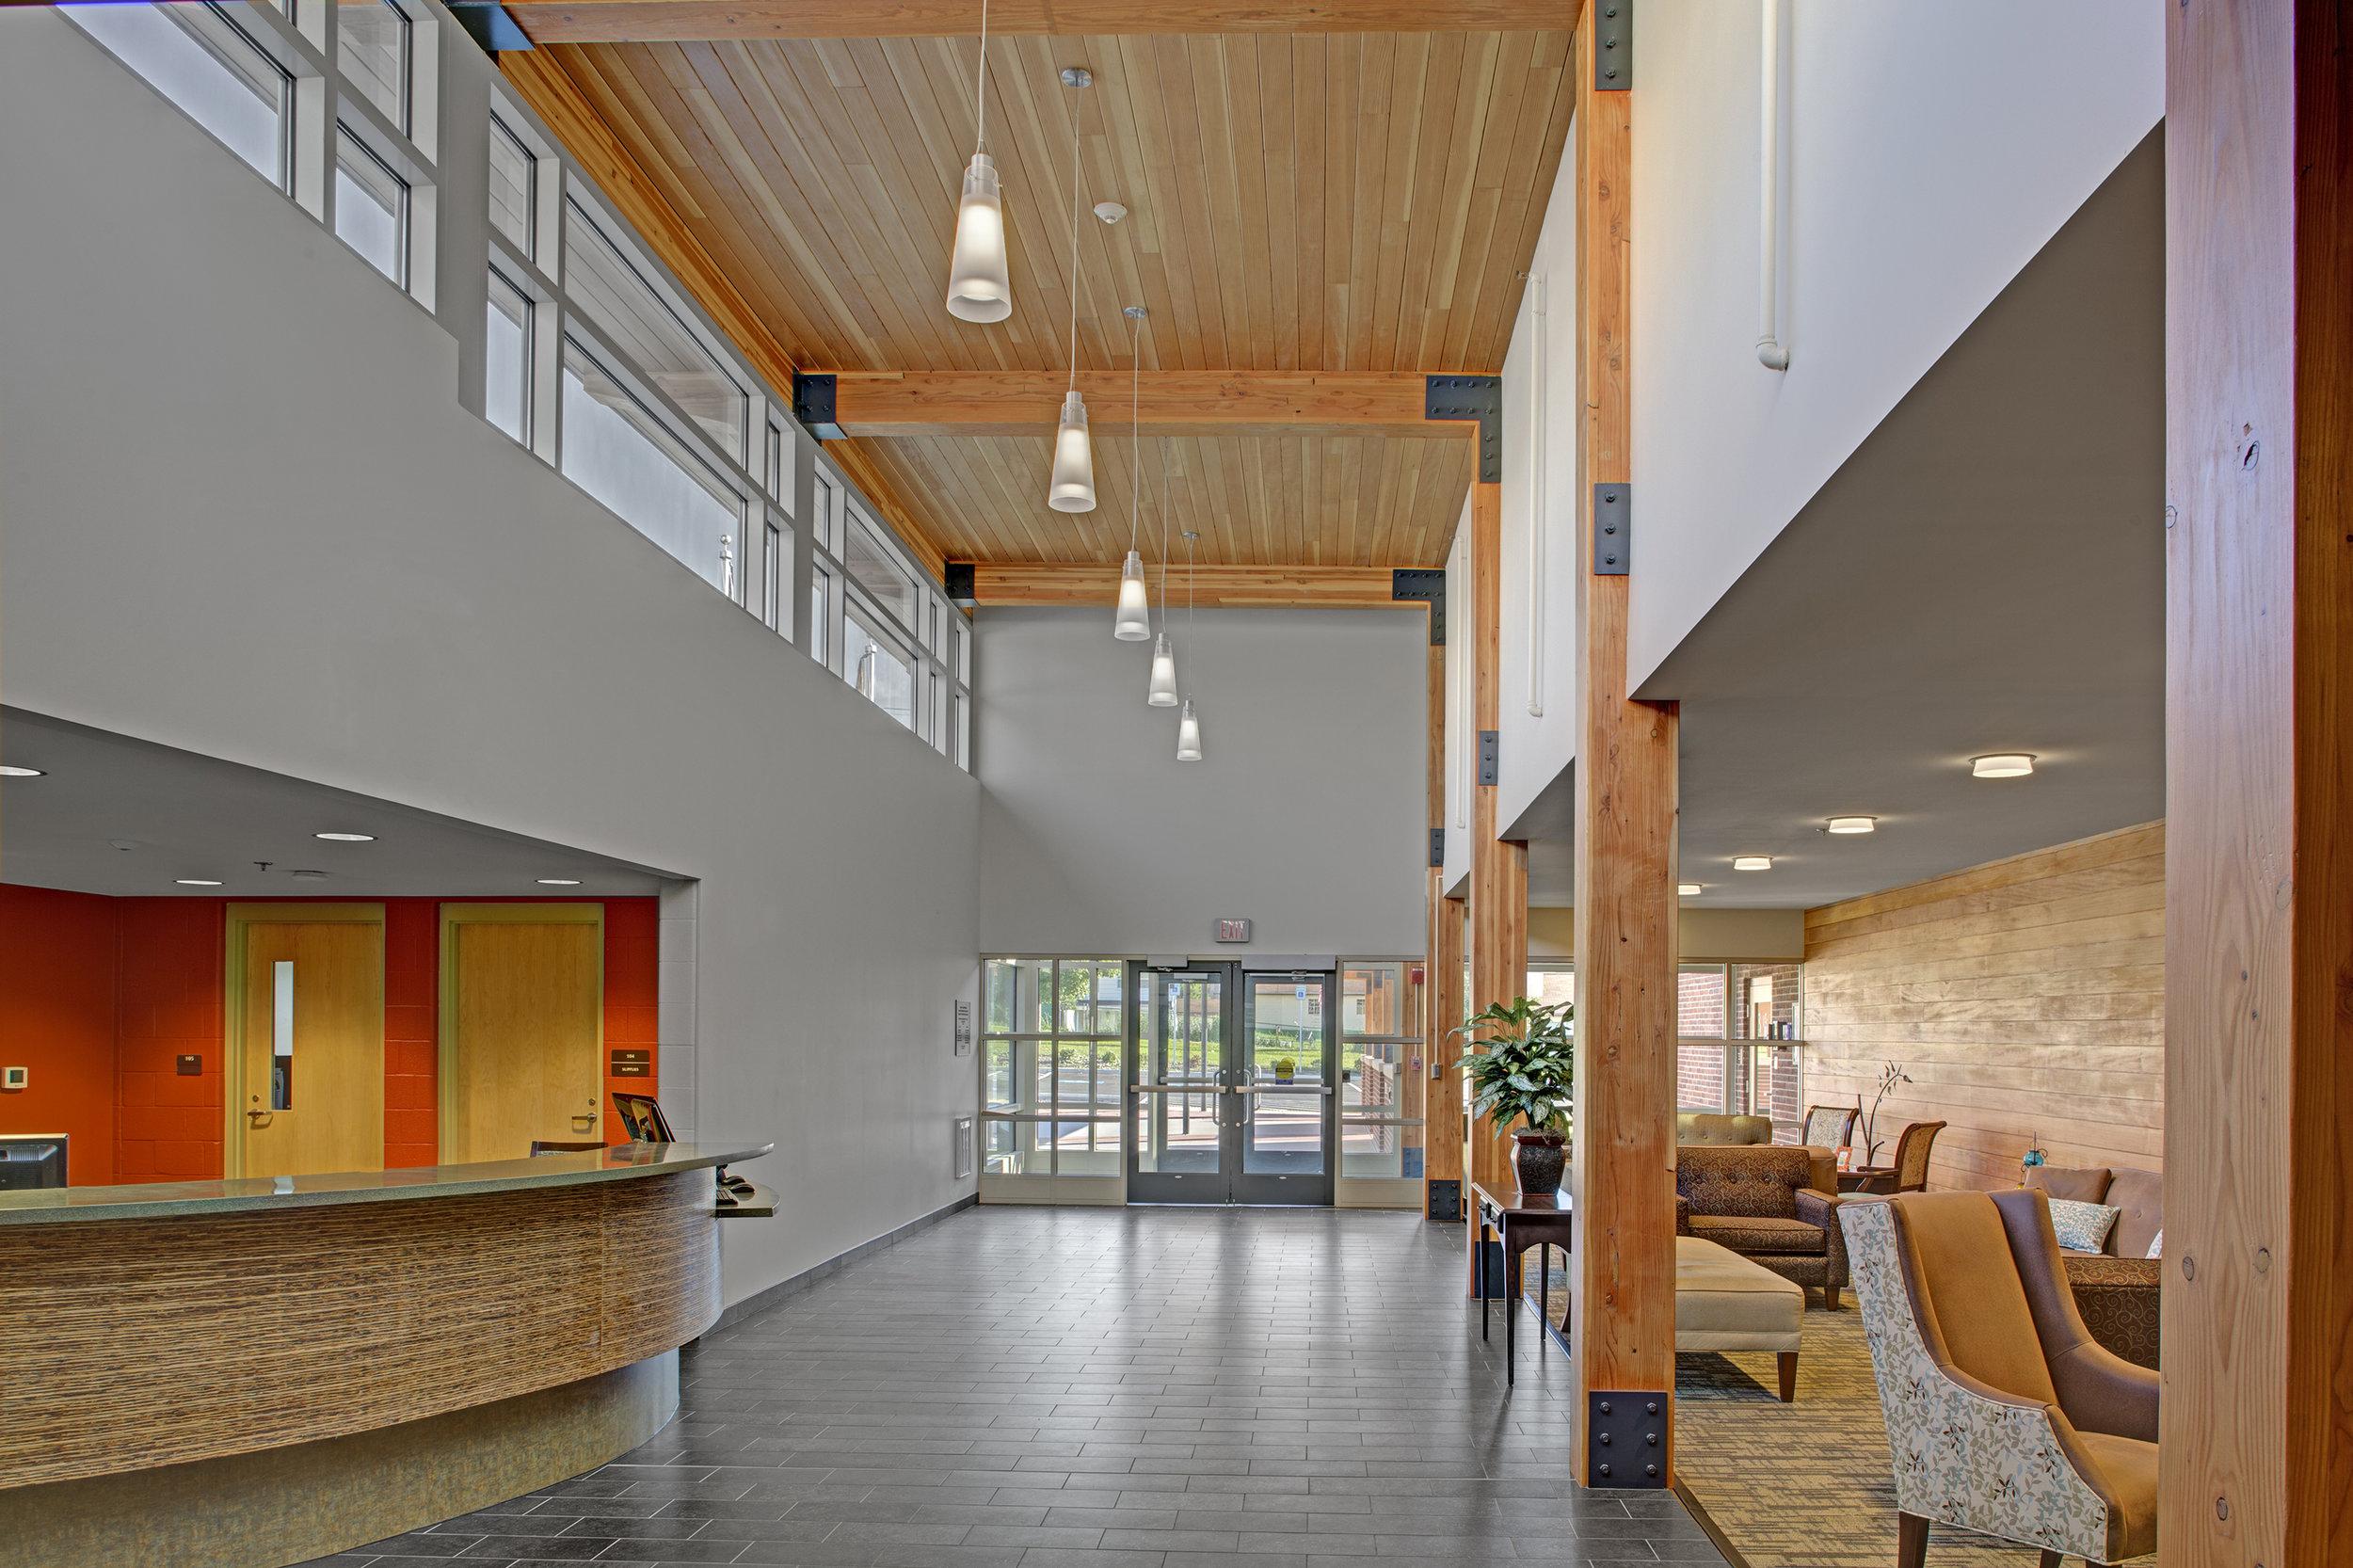 Washington County Senior Center and Commission on Aging